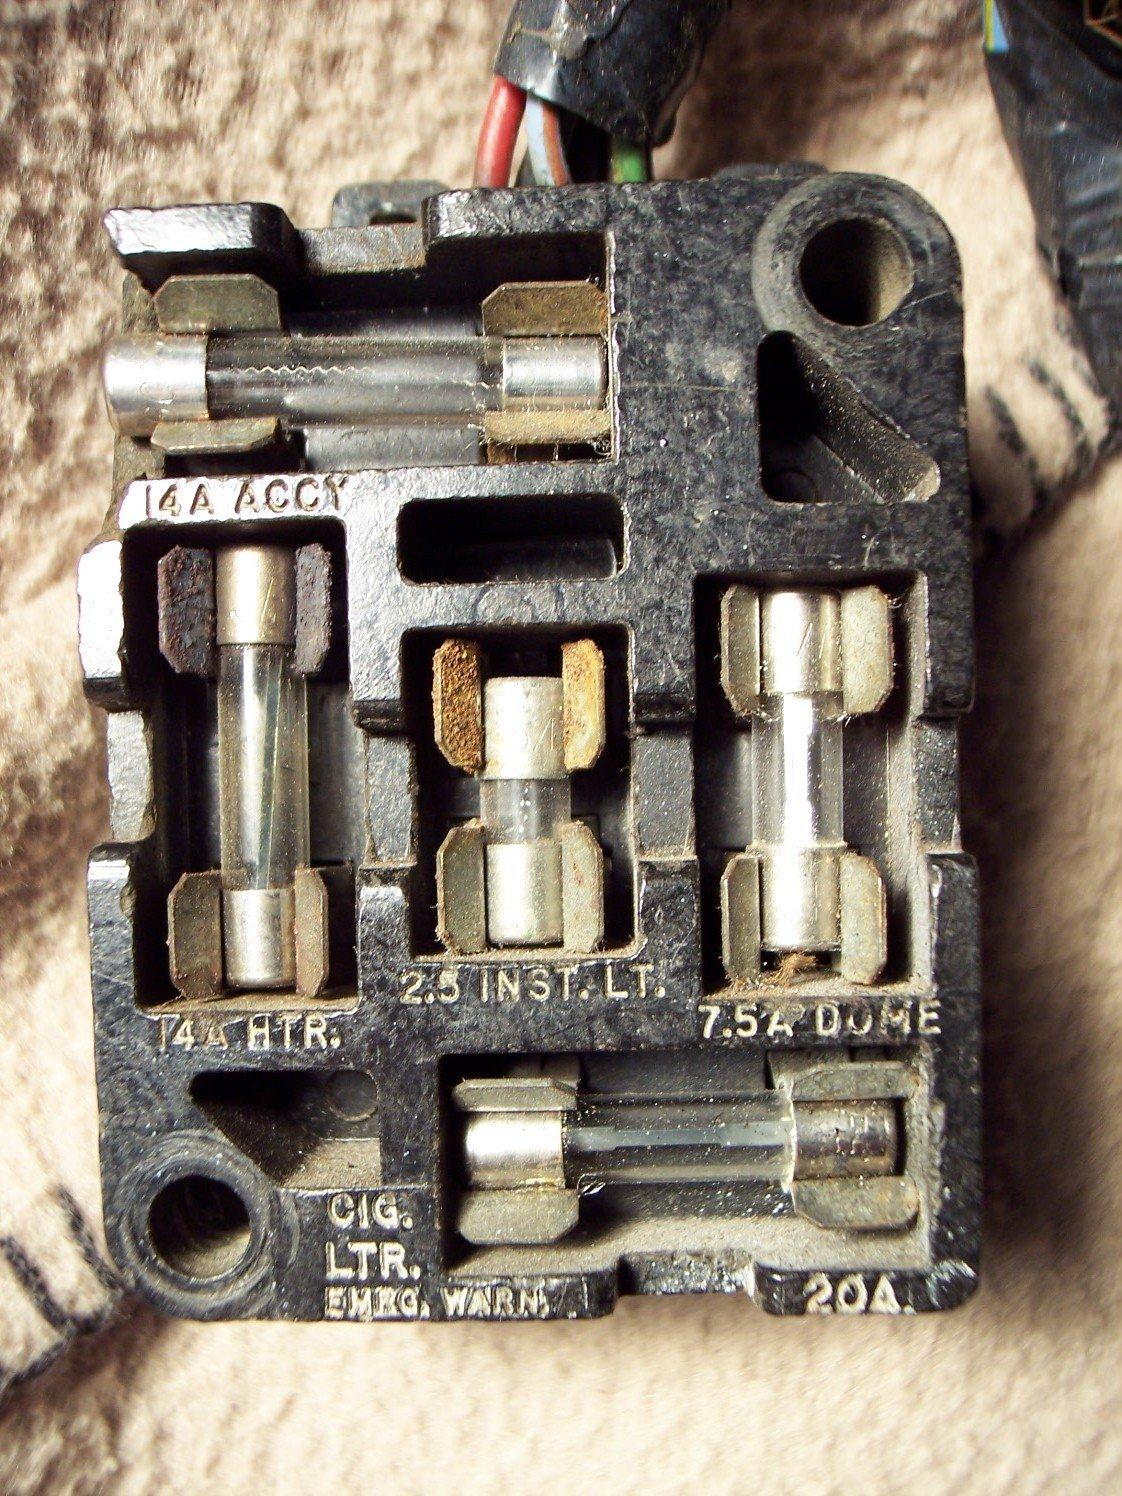 1965 ford mustang headlight wiring diagram temp control fuse panel / box diagram? - forum